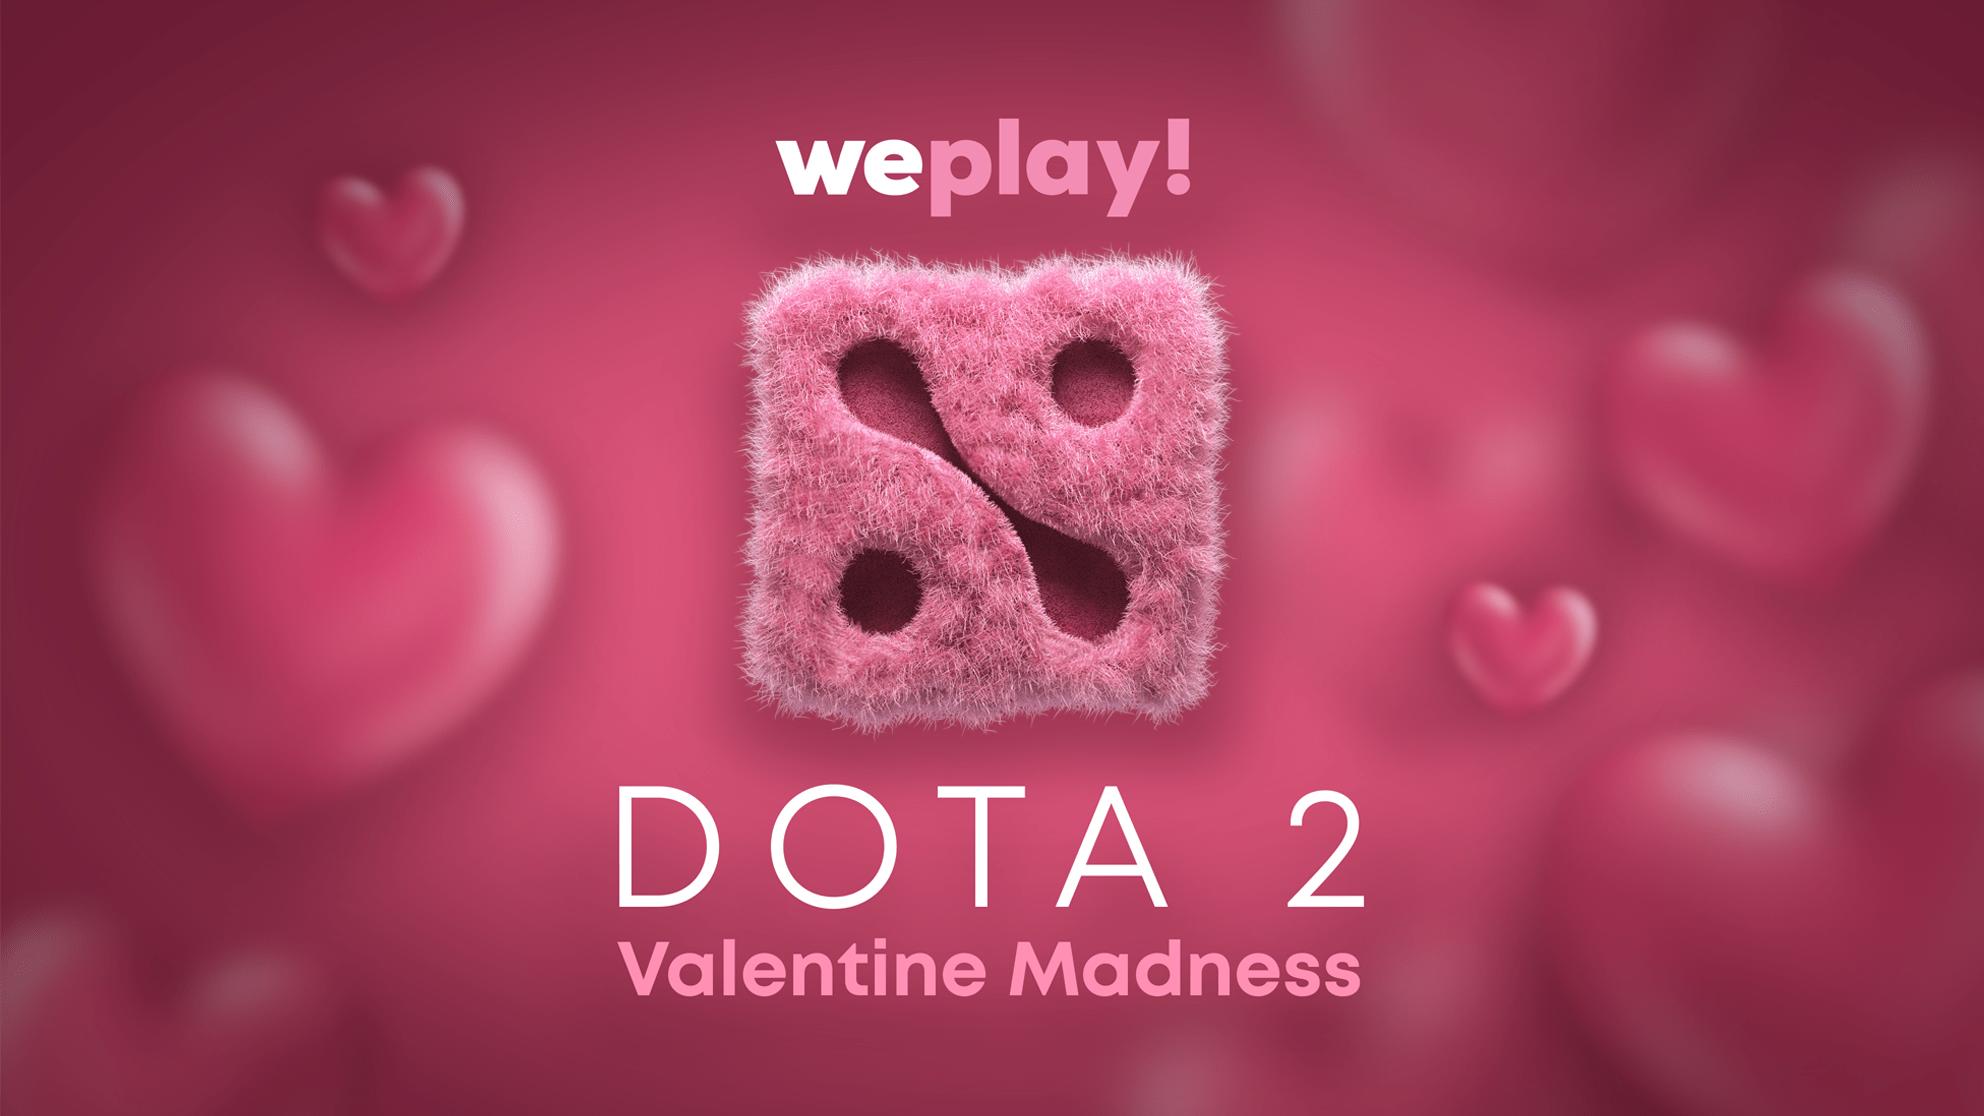 WePlay! Dota 2 Valentine Madness 2019